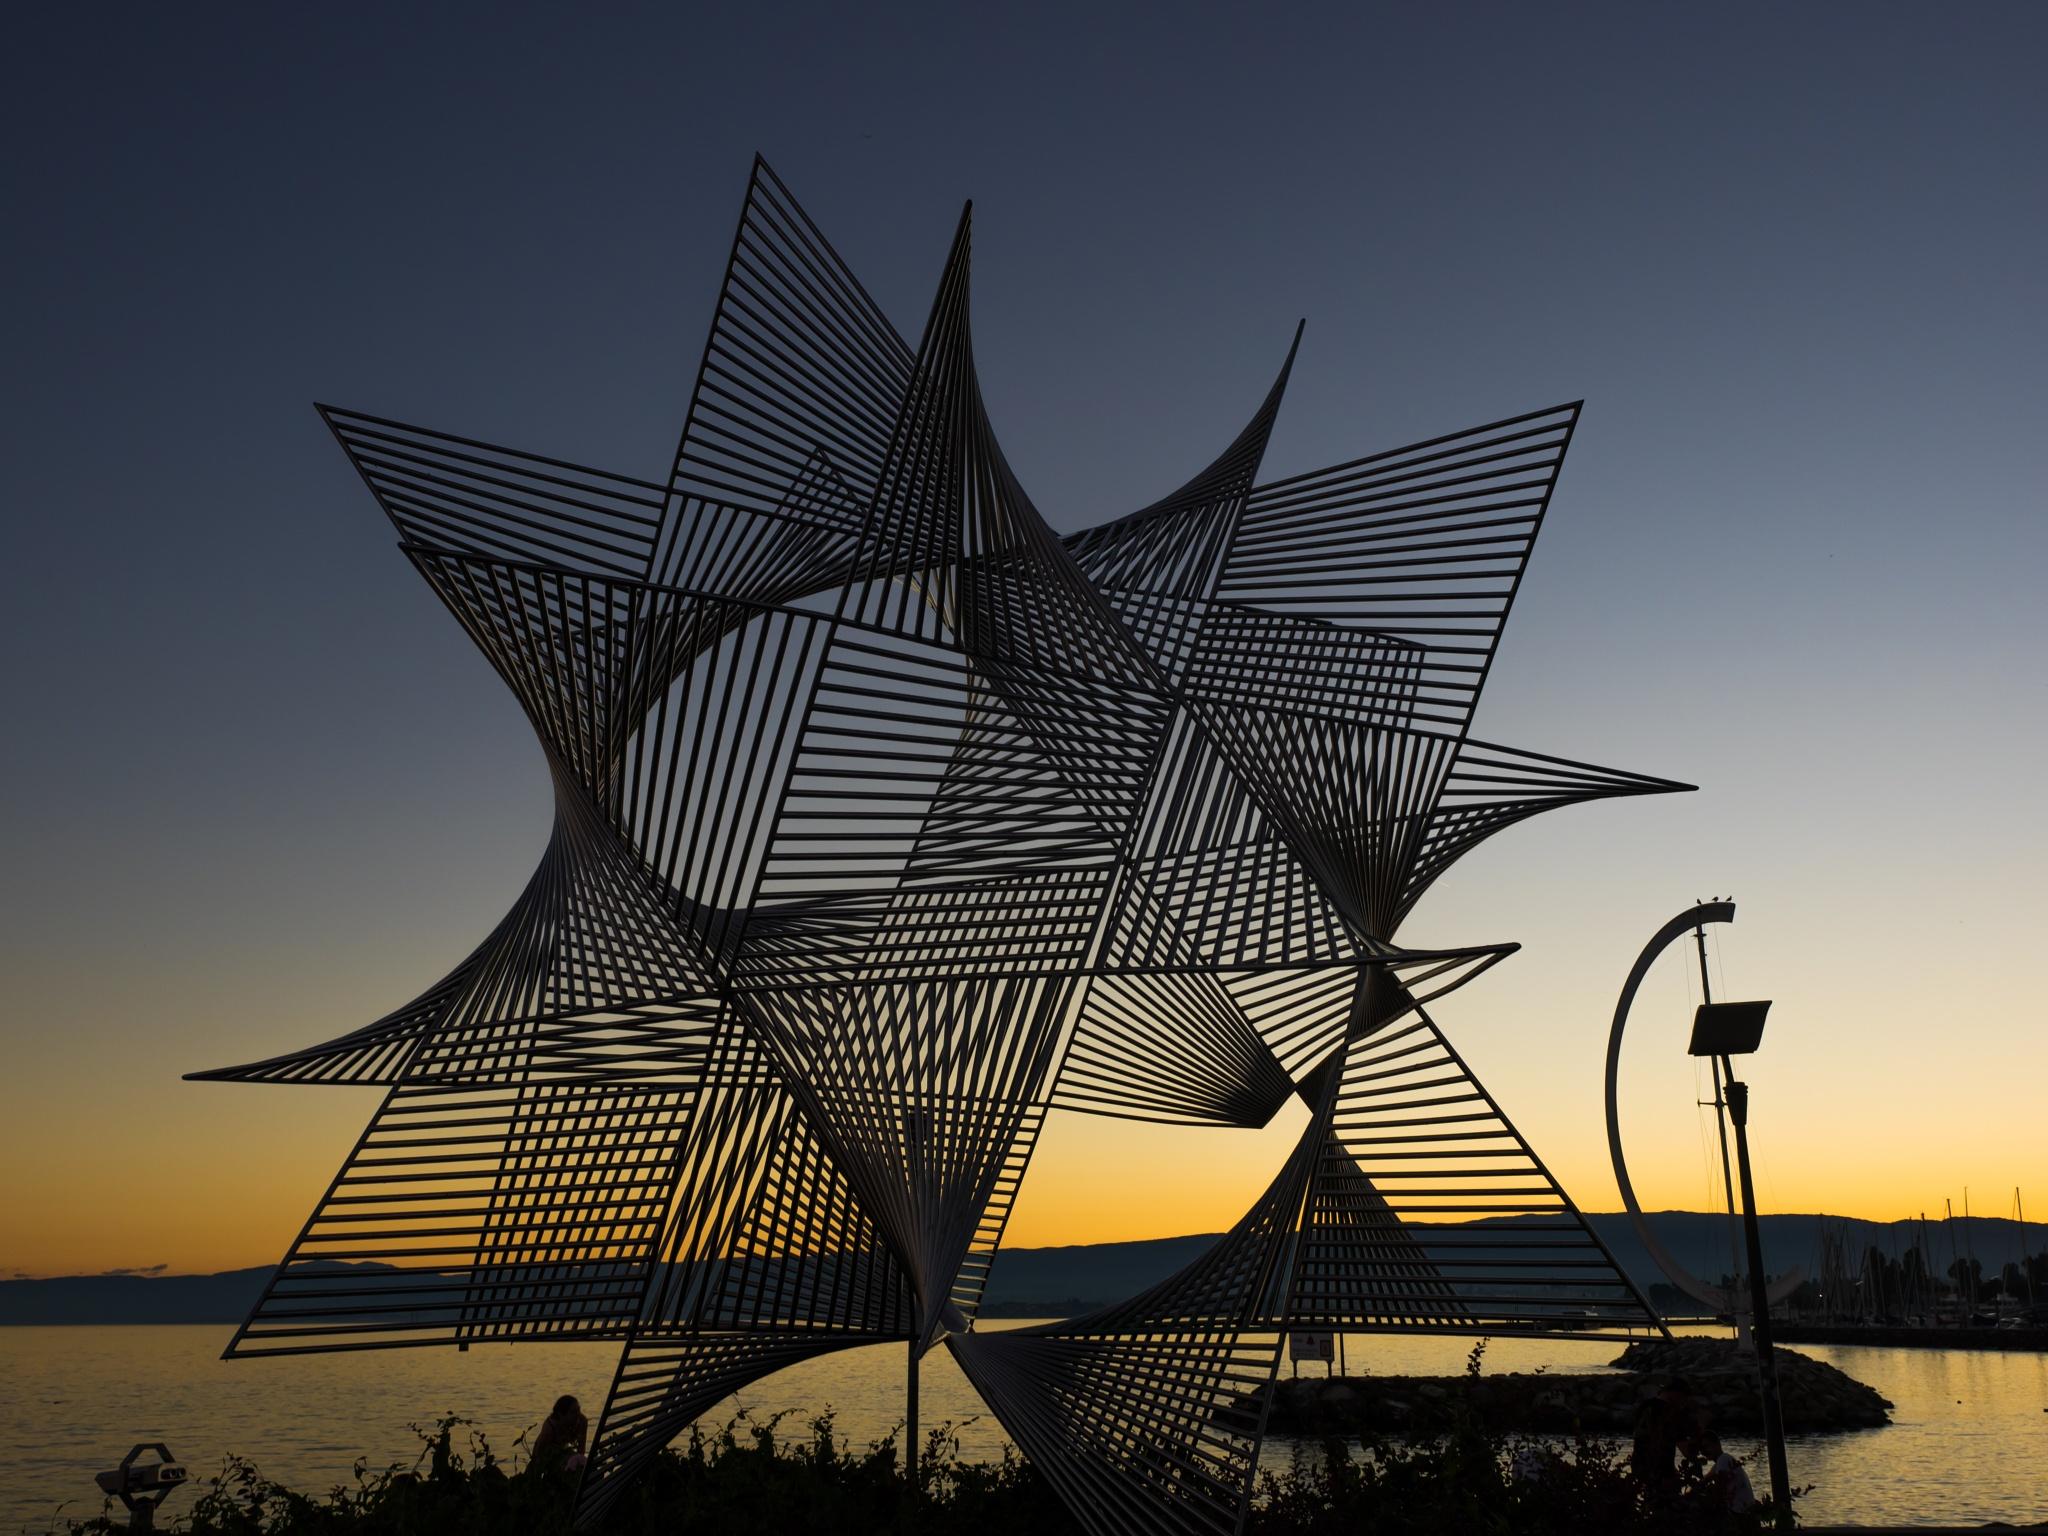 Art at lake geneve by pixer